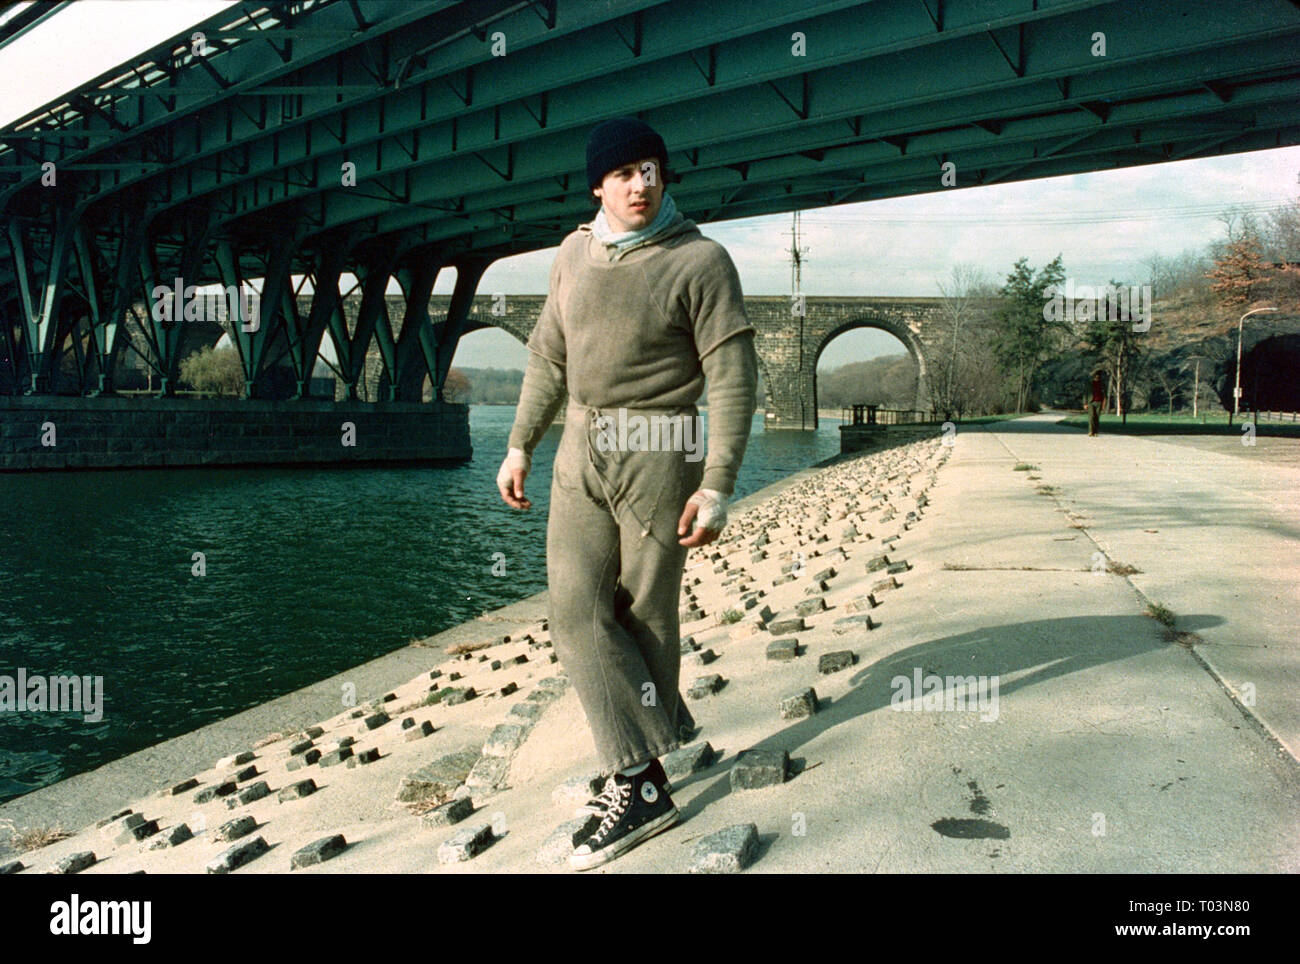 SYLVESTER STALLONE, ROCKY, 1976 - Stock Image